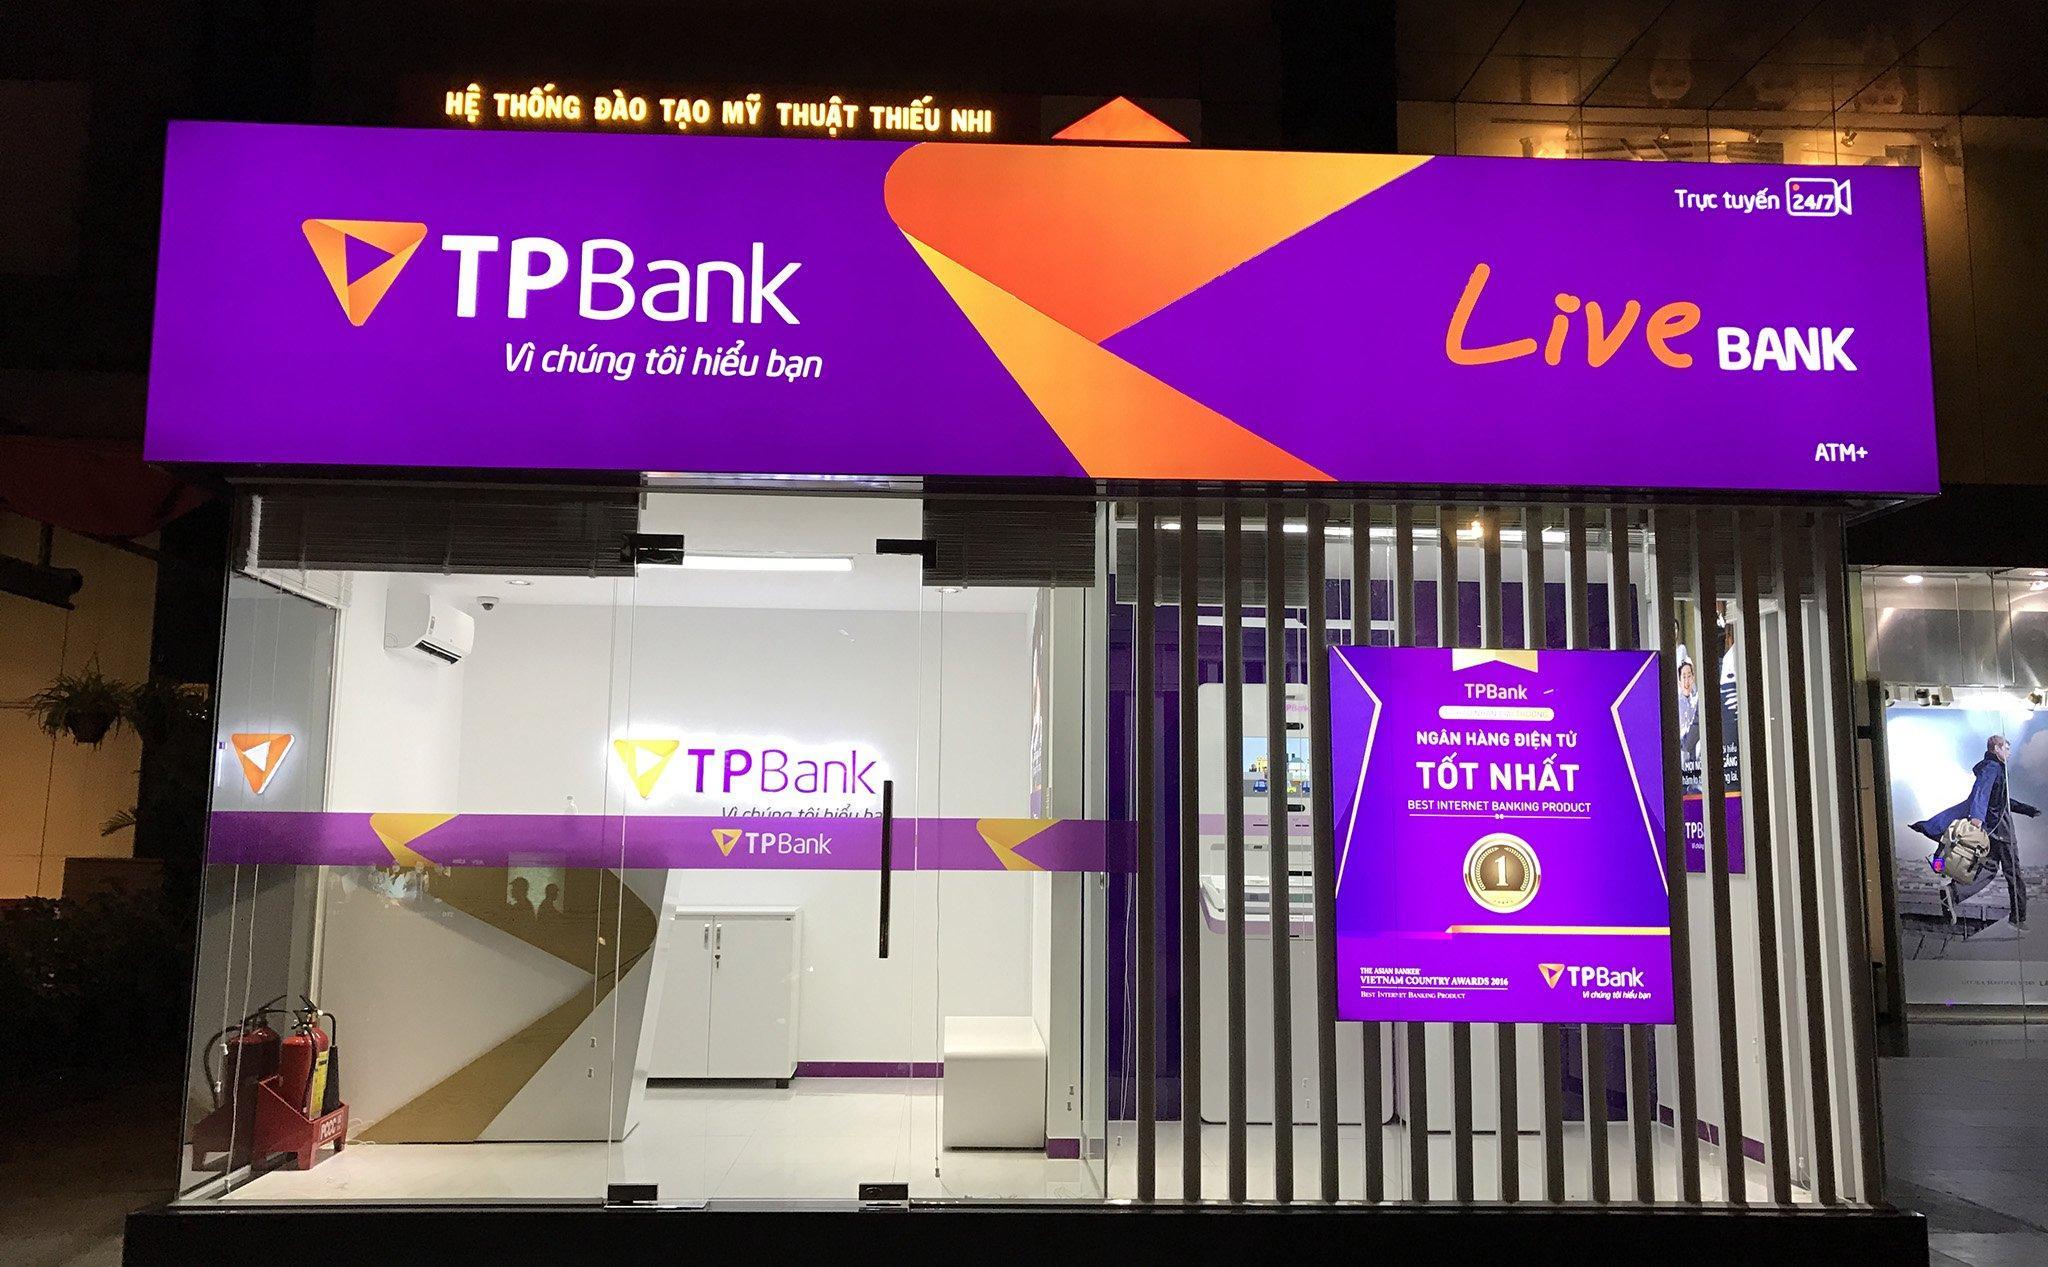 logo cua tpbank